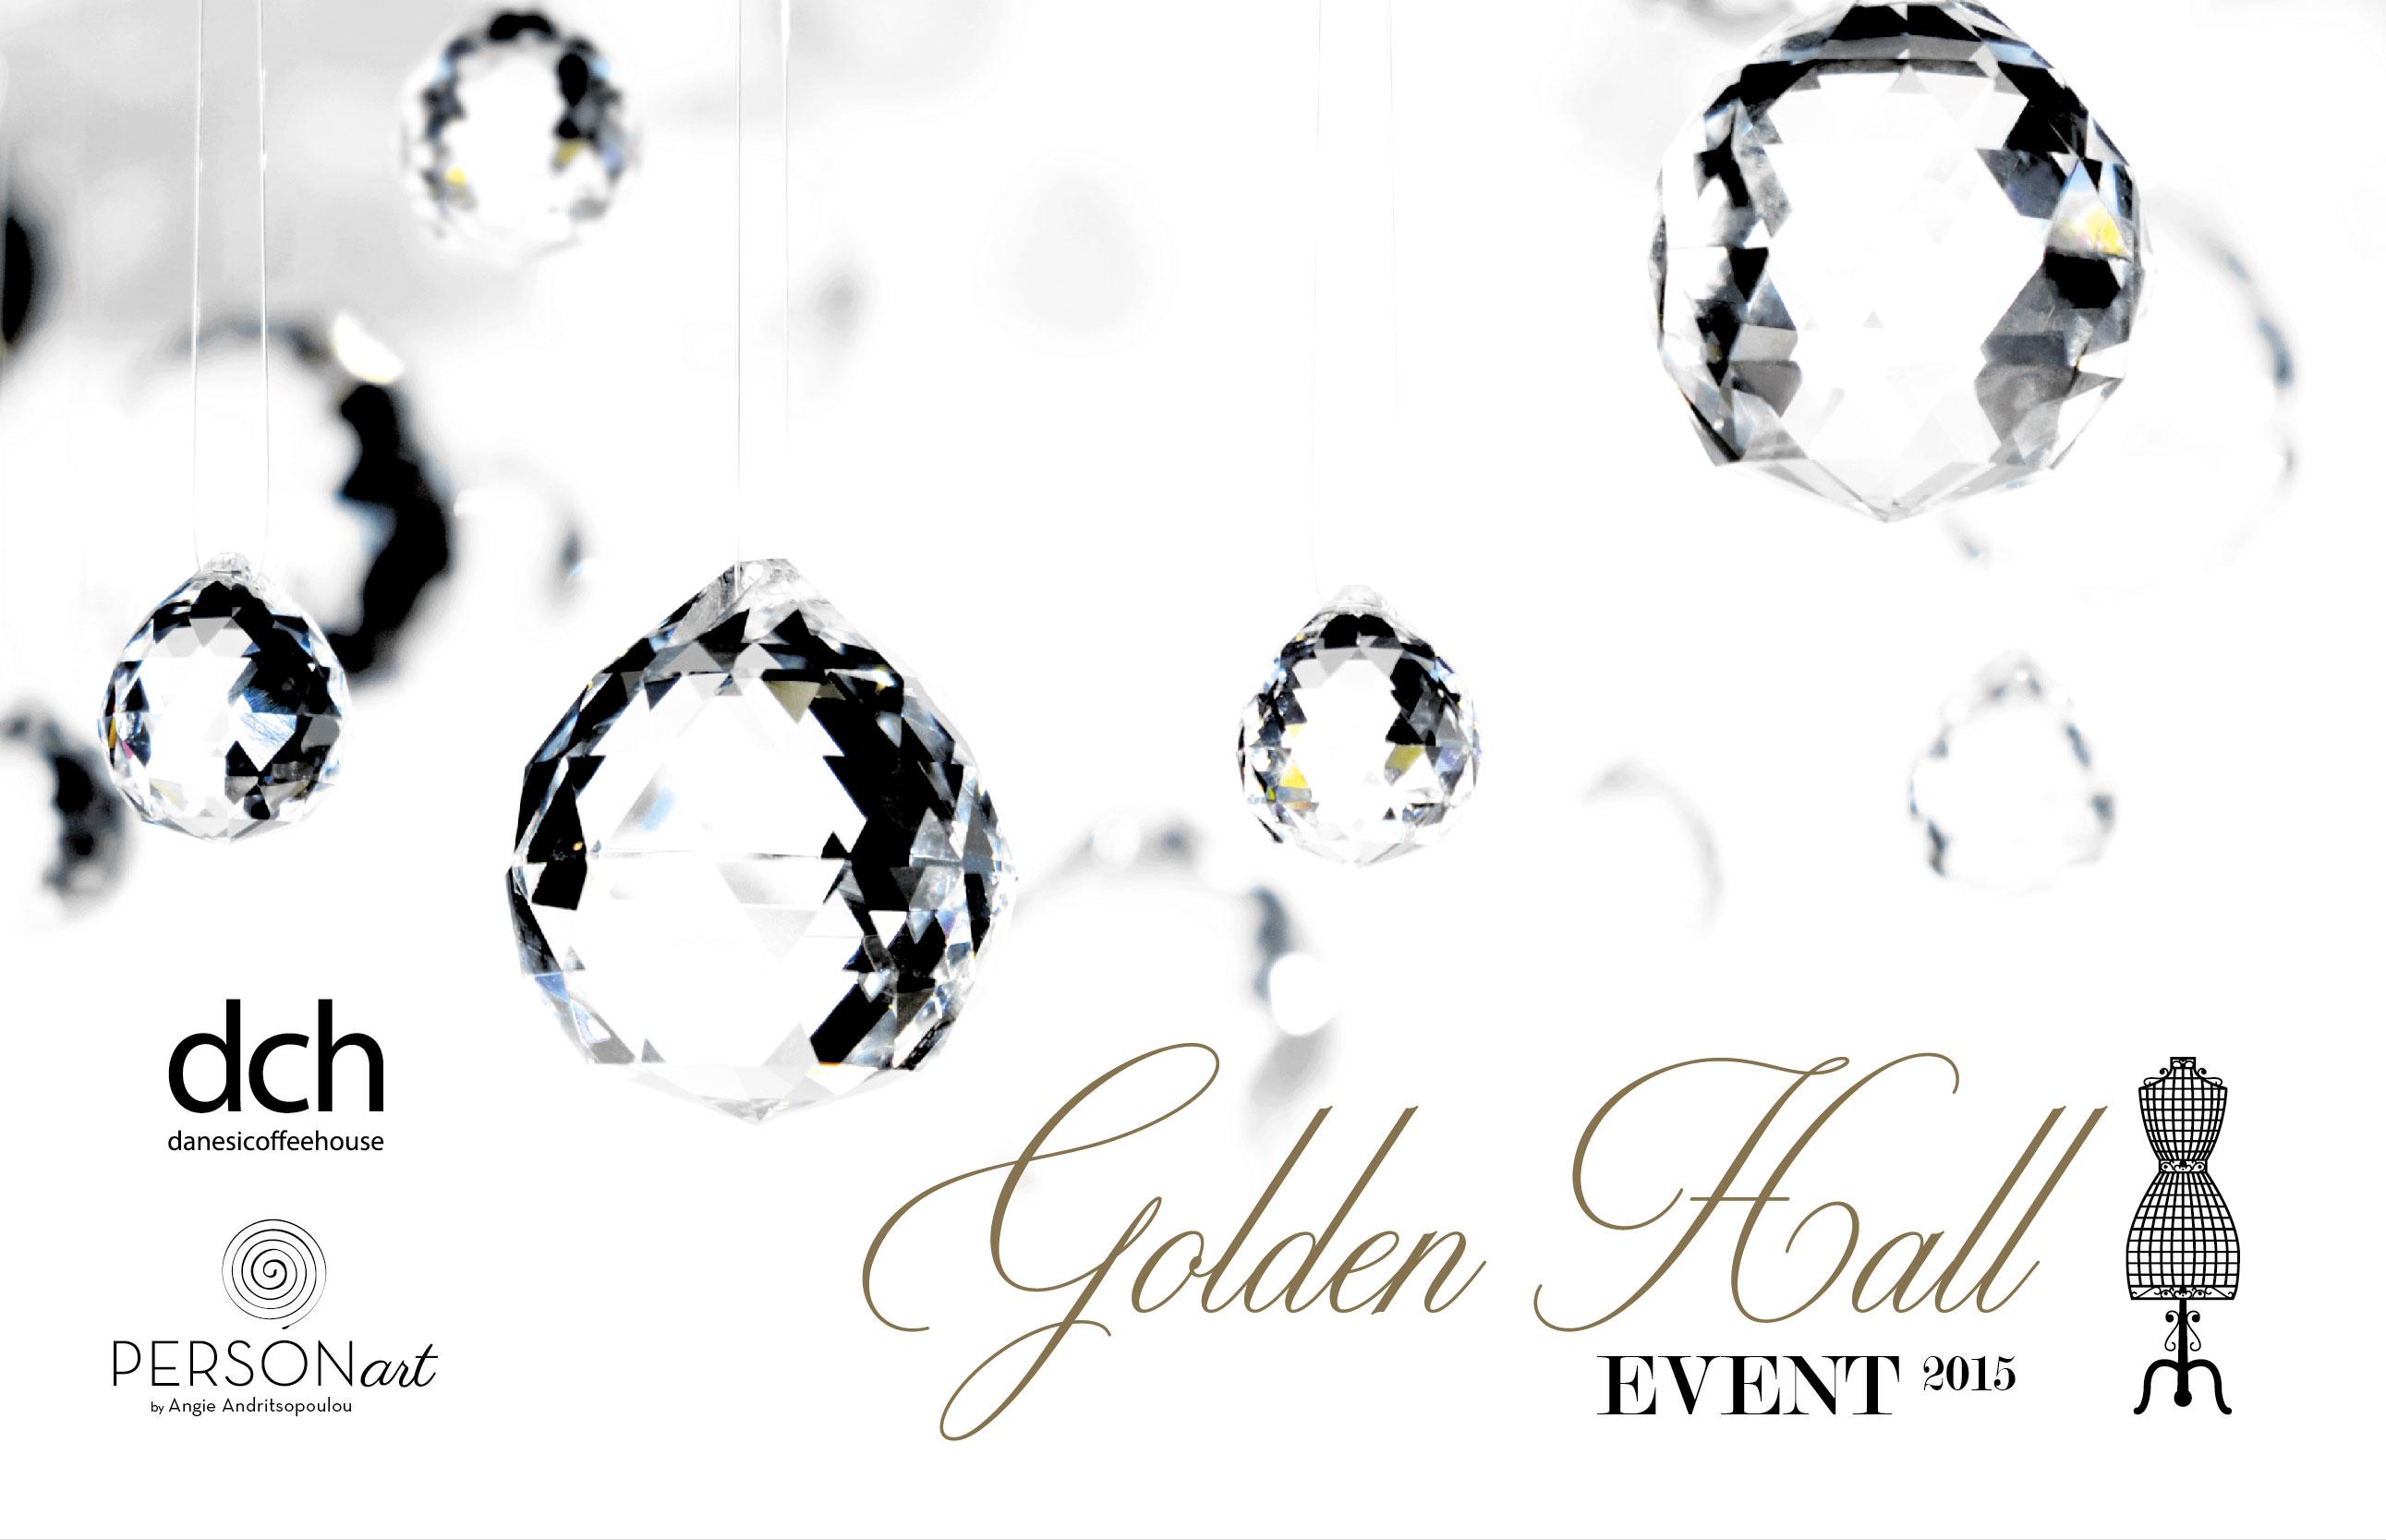 golden-hall-event-2015-01